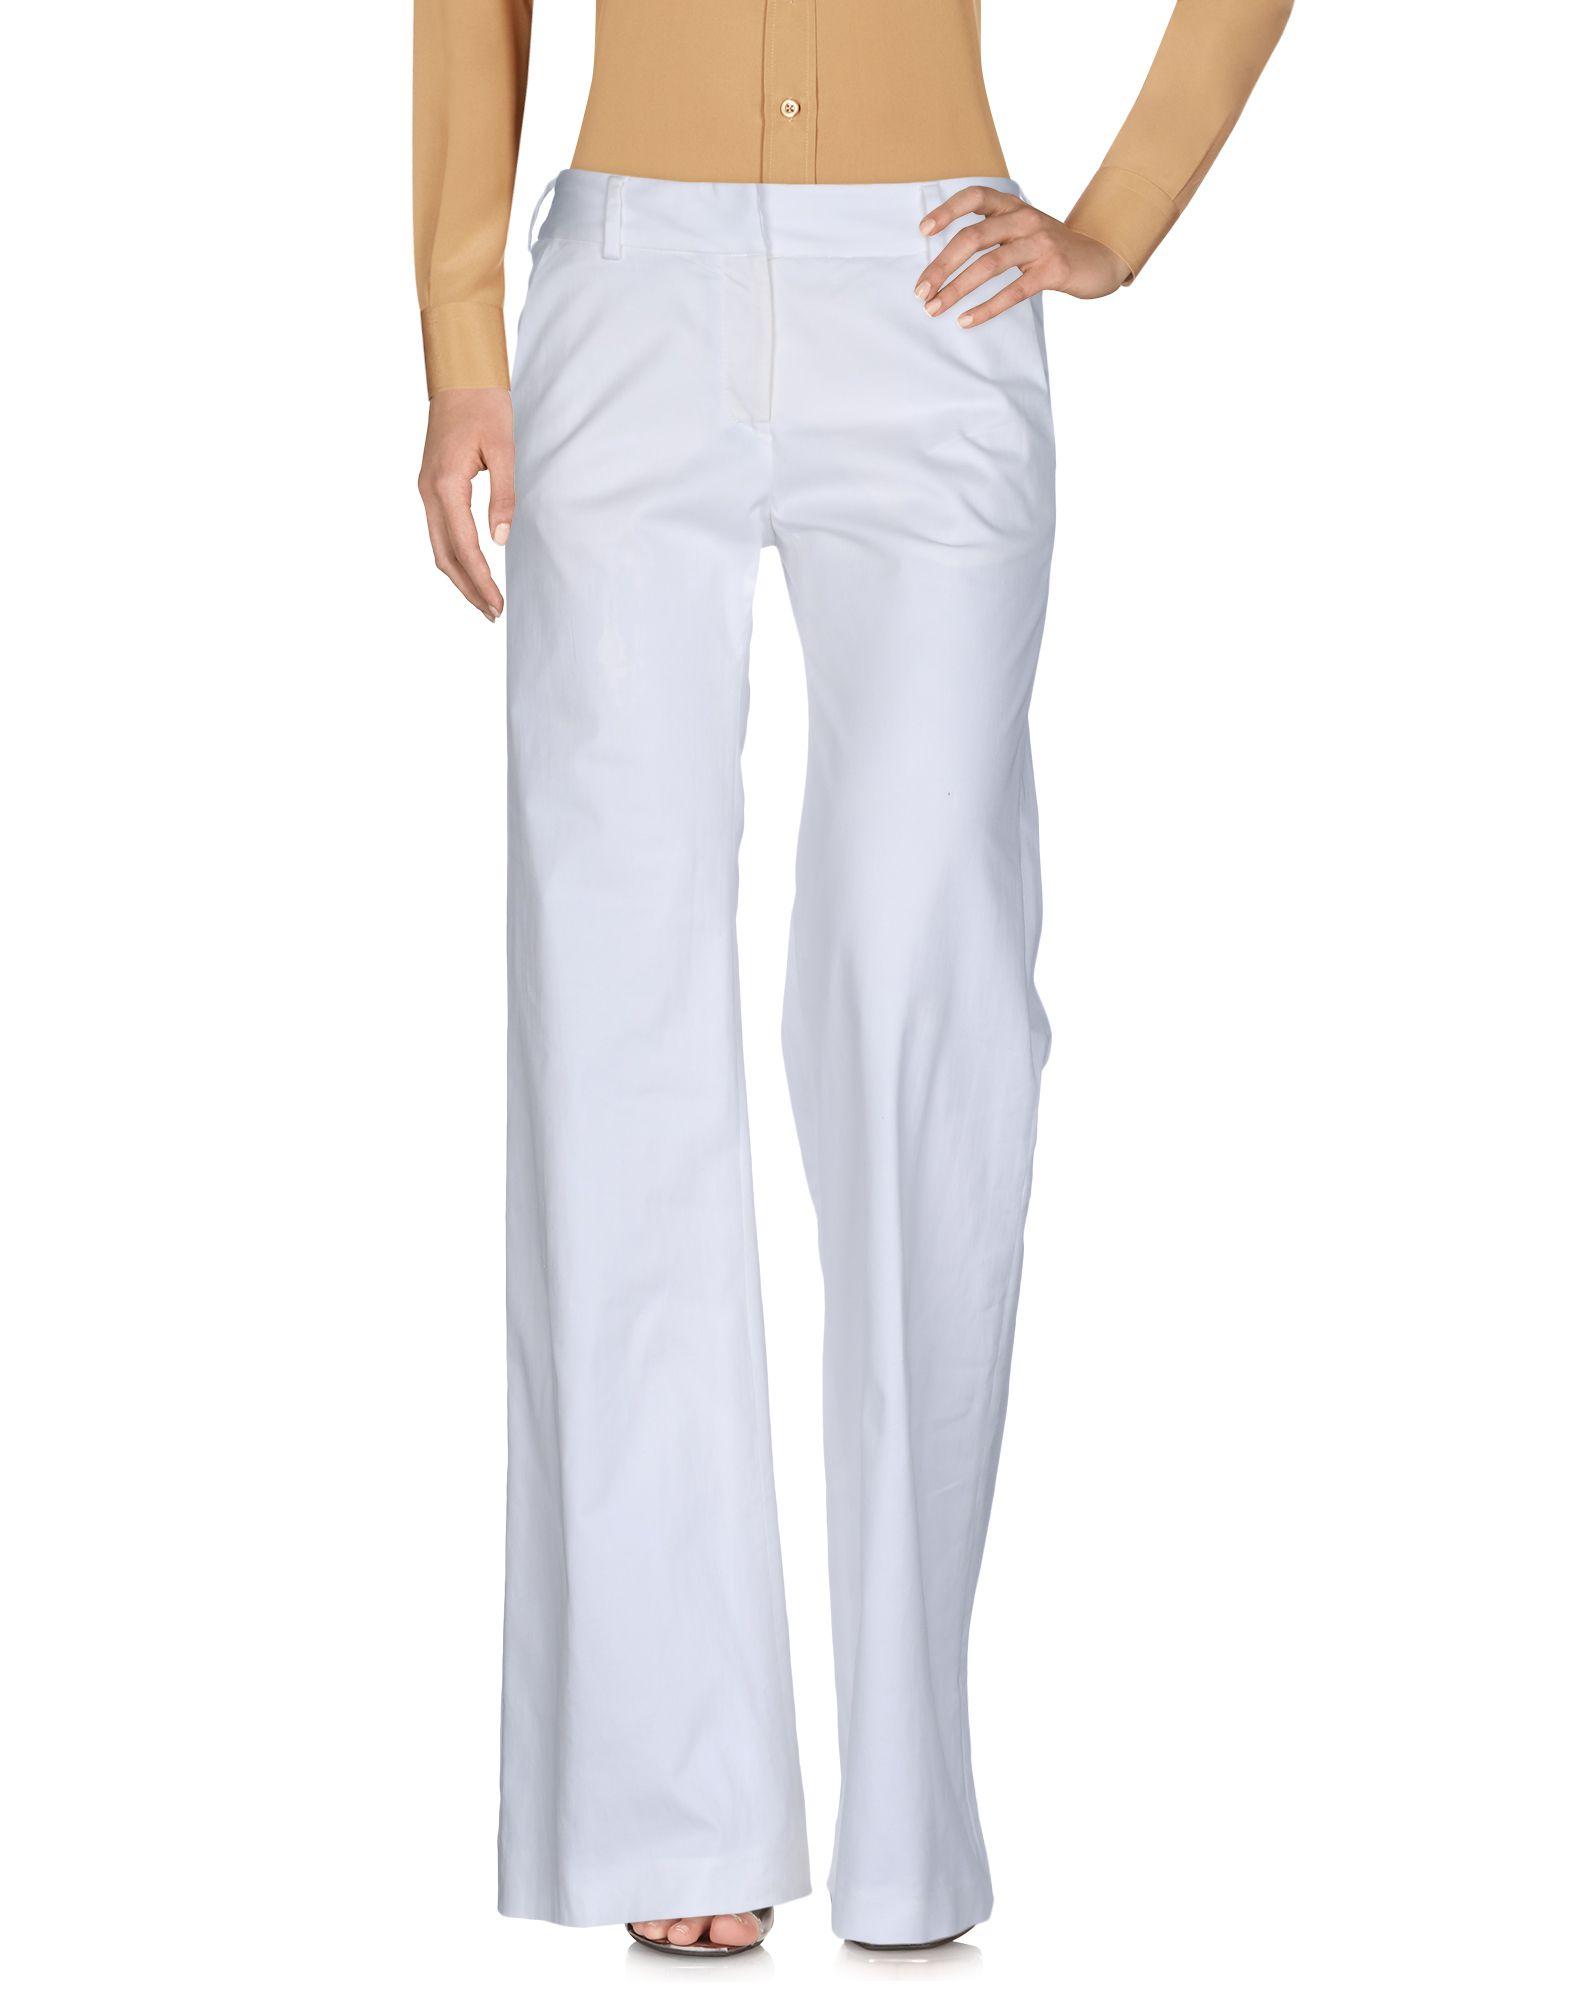 En Ligne Missoni M Pantalons À FemmeAcheter rhtsQCd